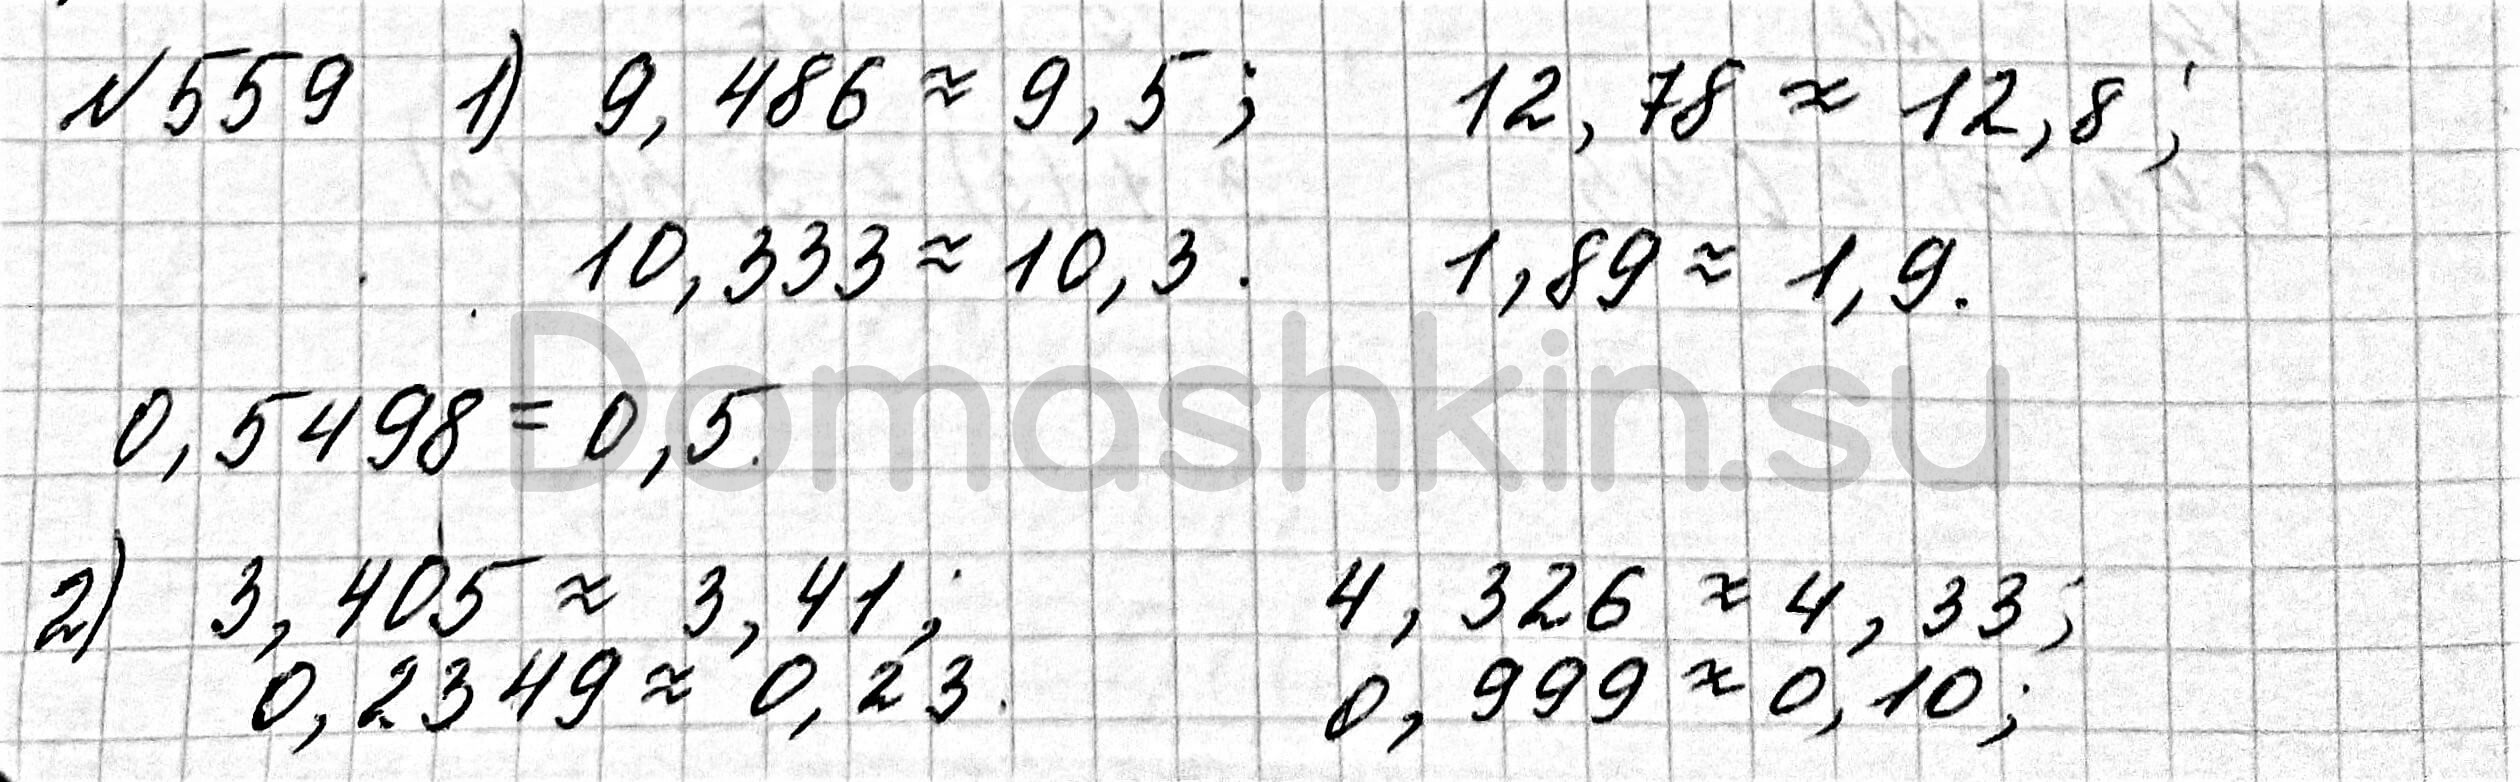 Математика 6 класс учебник Мерзляк номер 559 решение